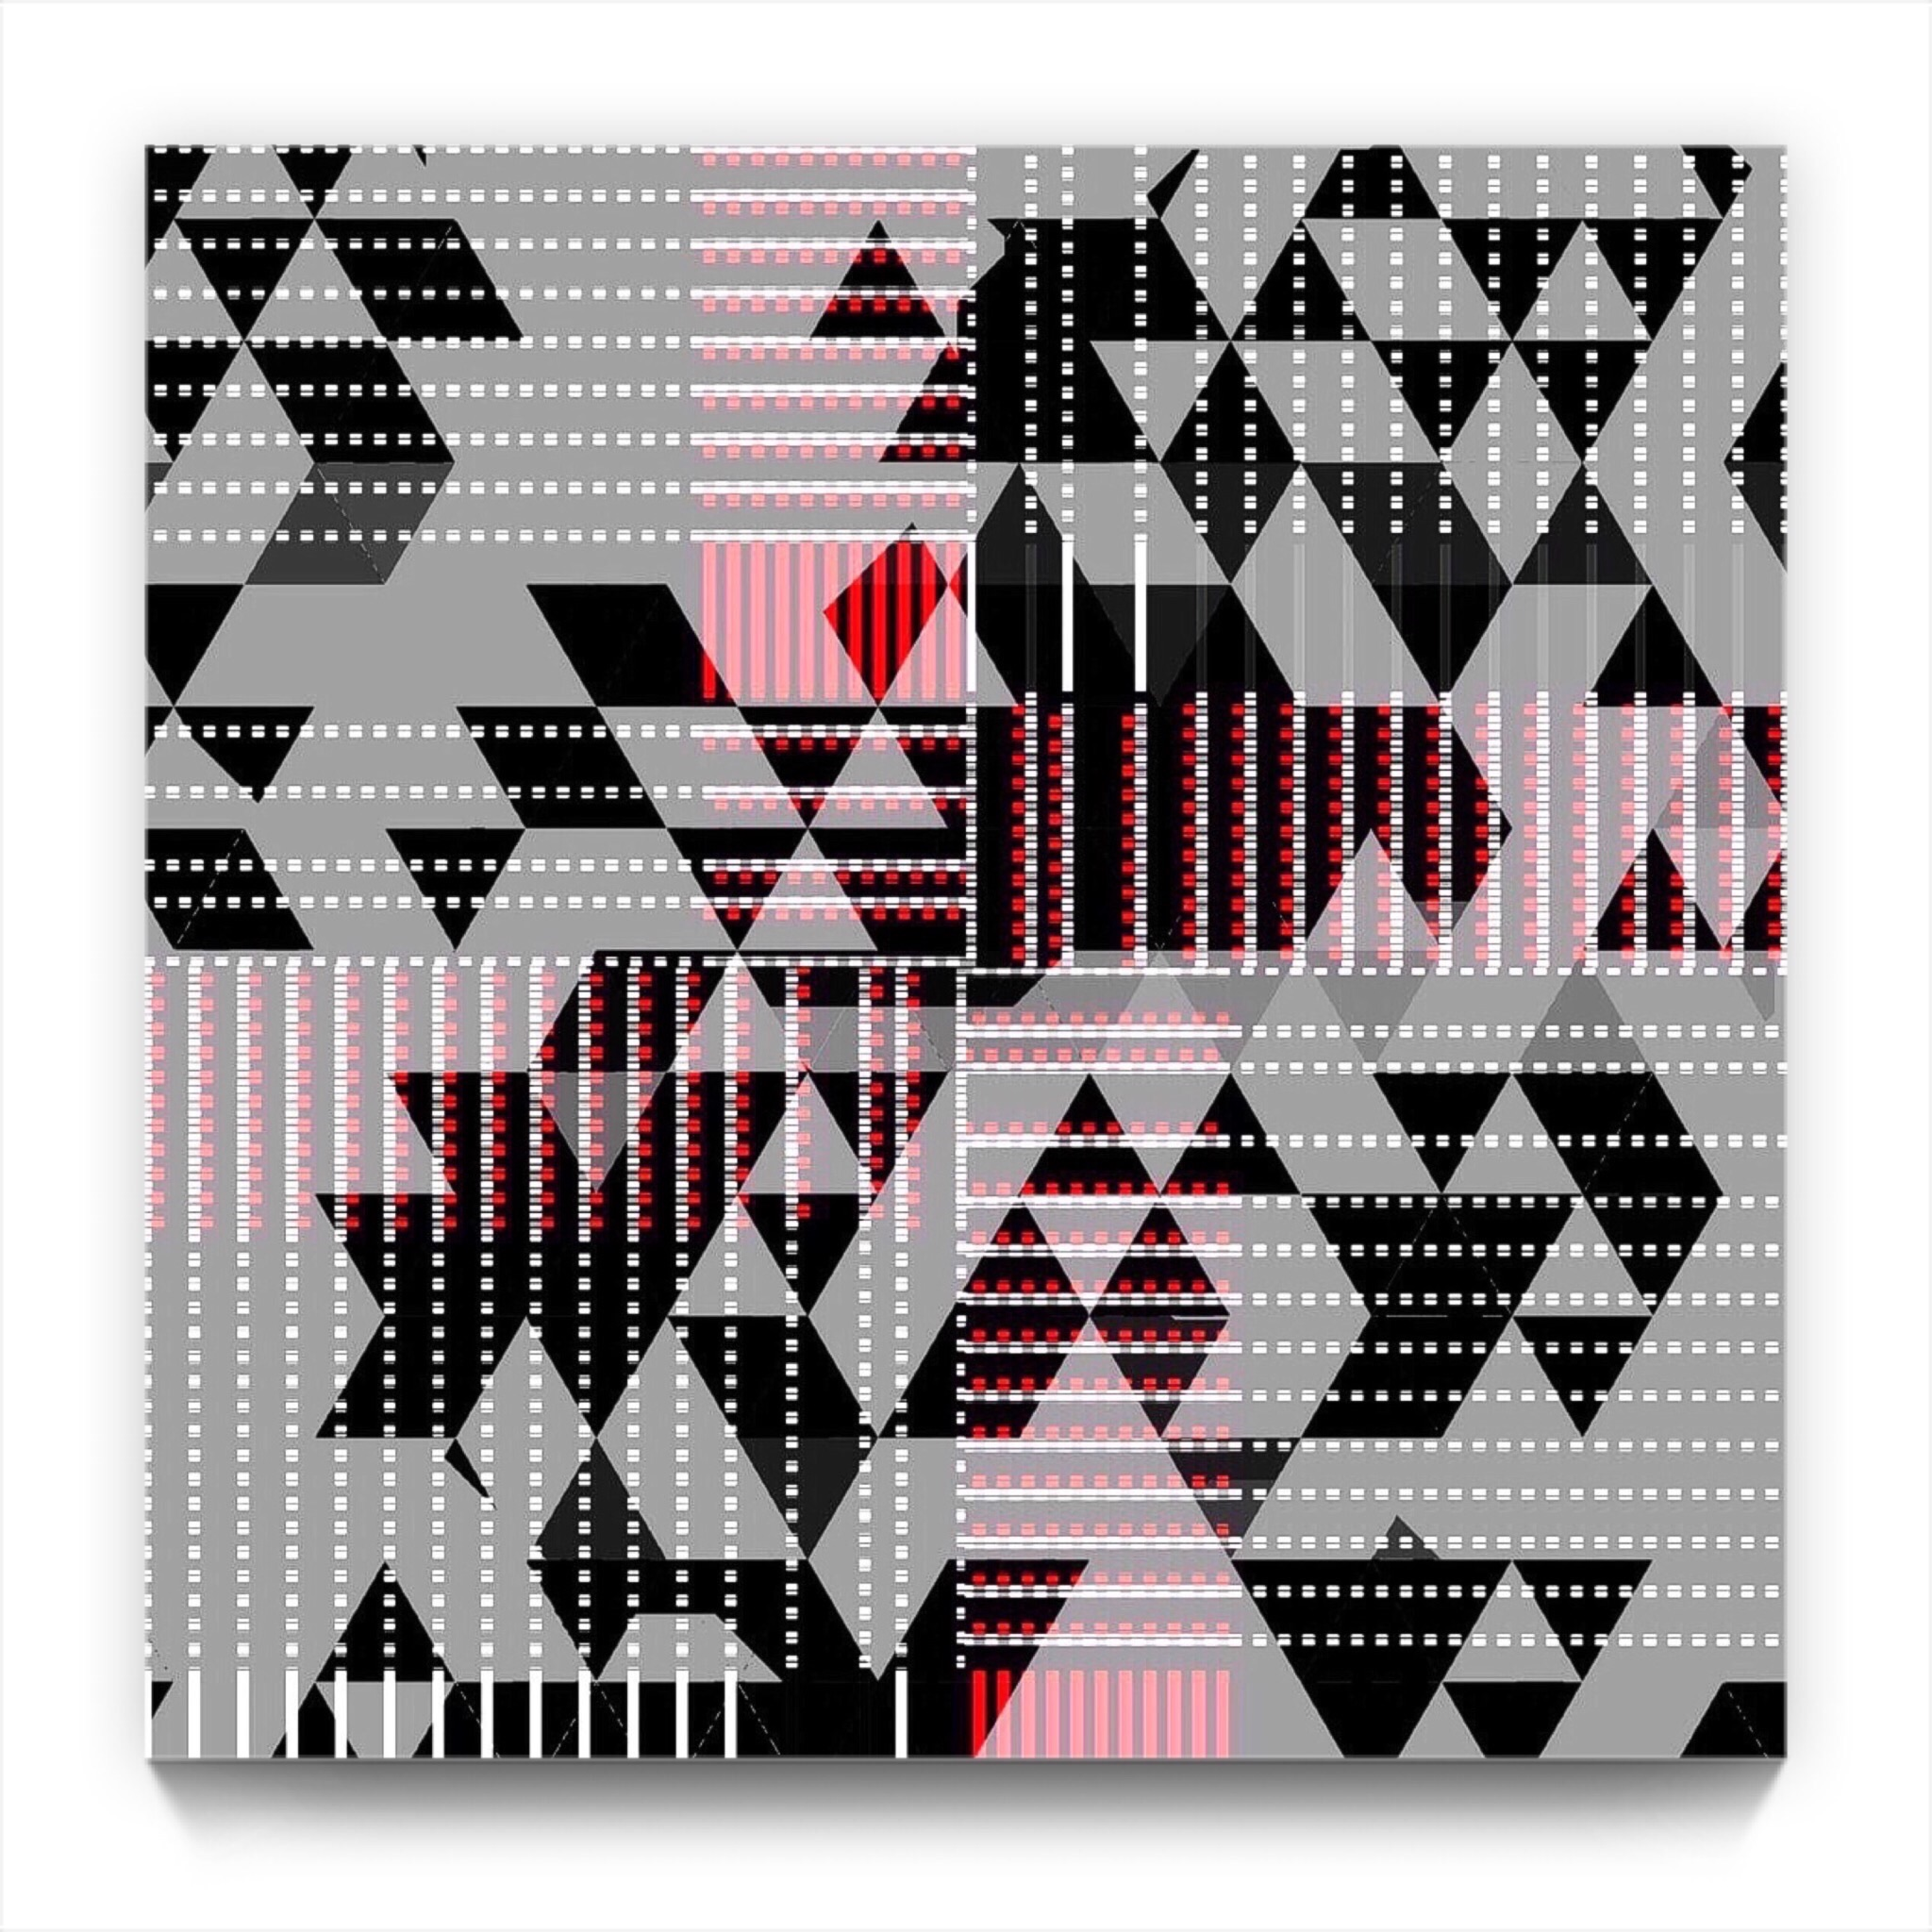 DiMiSiT . 2015 by New Media iPhone Digital Artist Mark Sedgwick